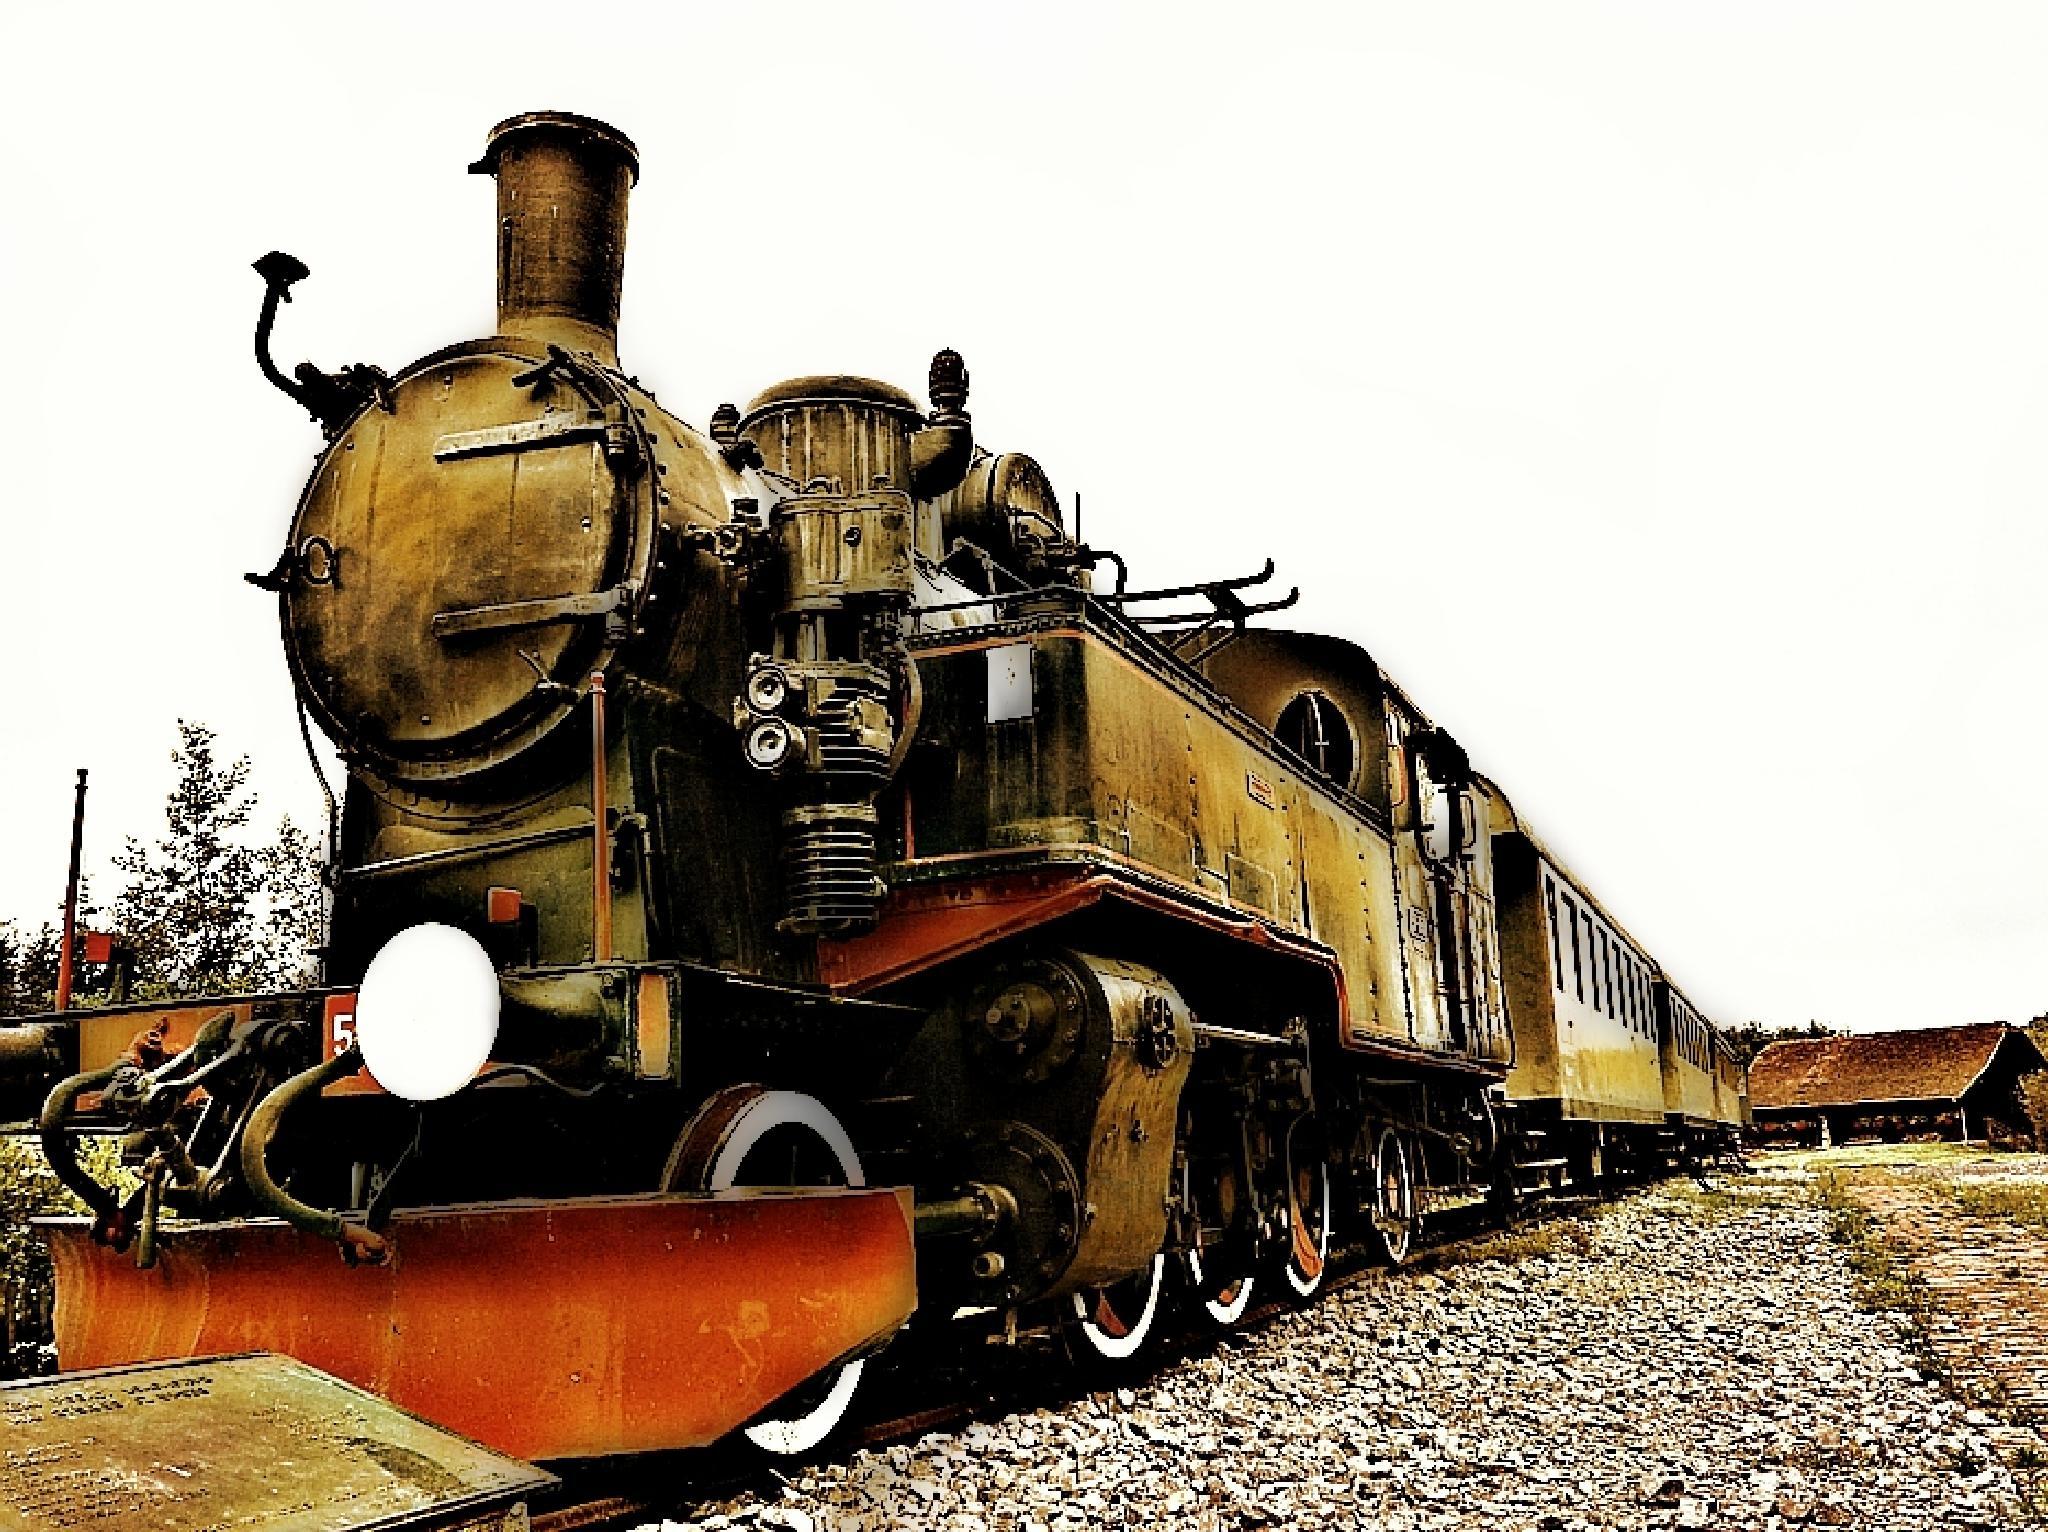 Train full of memories by ksenija.glavak